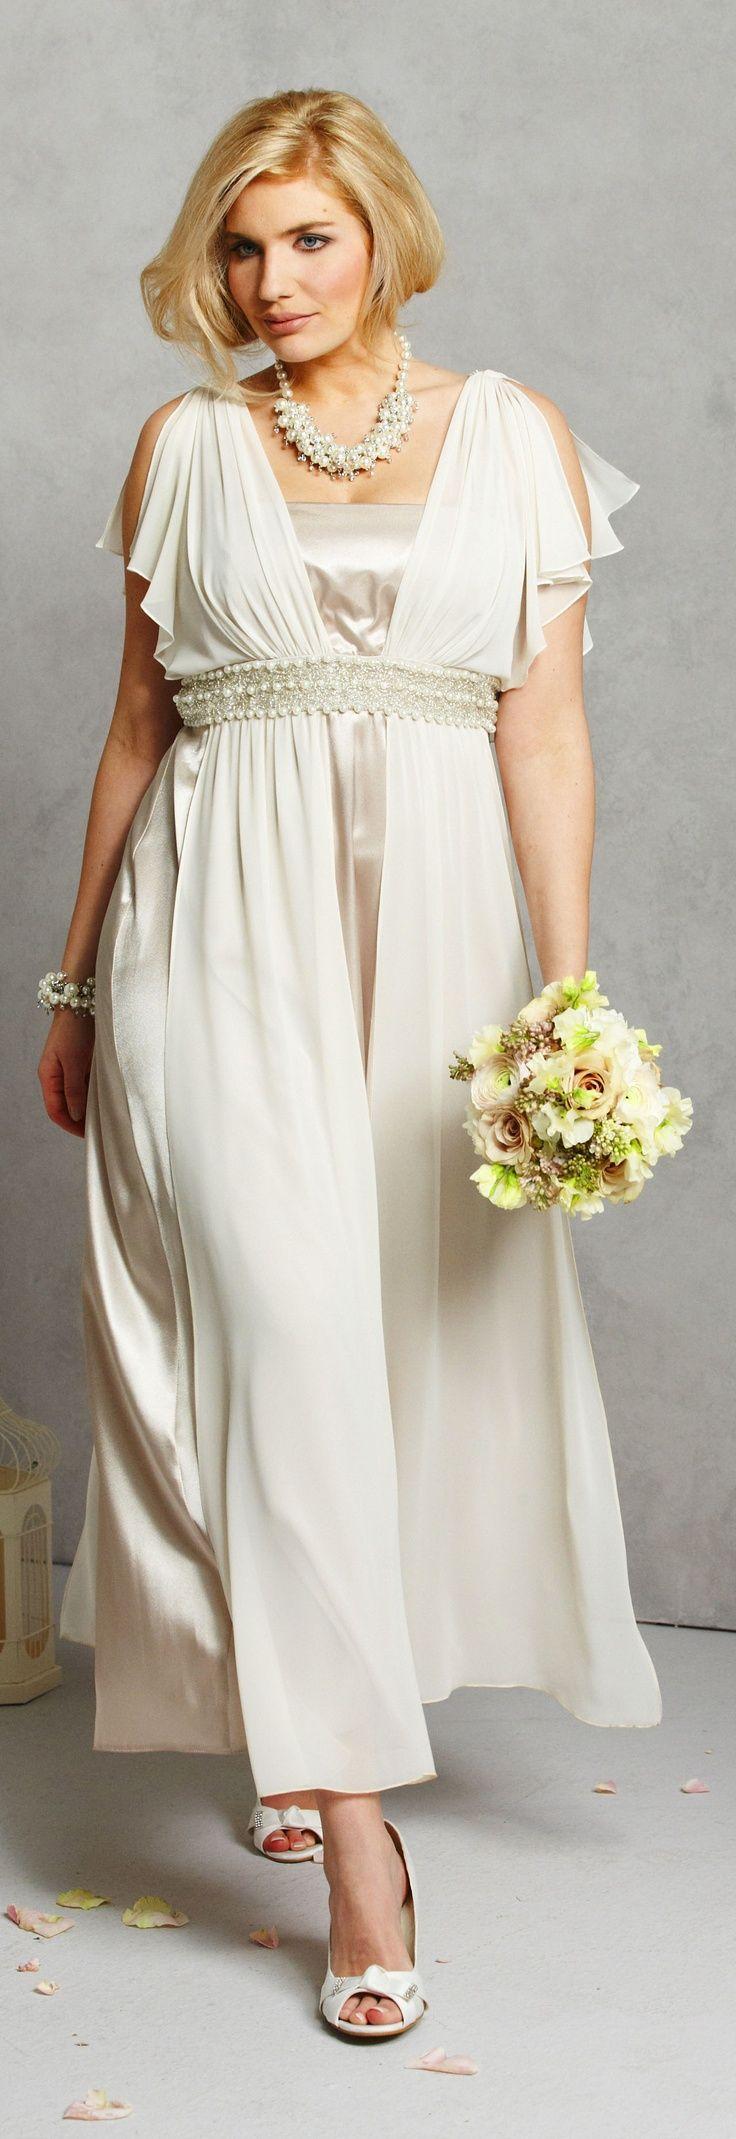 17 best images about mature beauty bride on pinterest for Sophisticated wedding dresses older brides